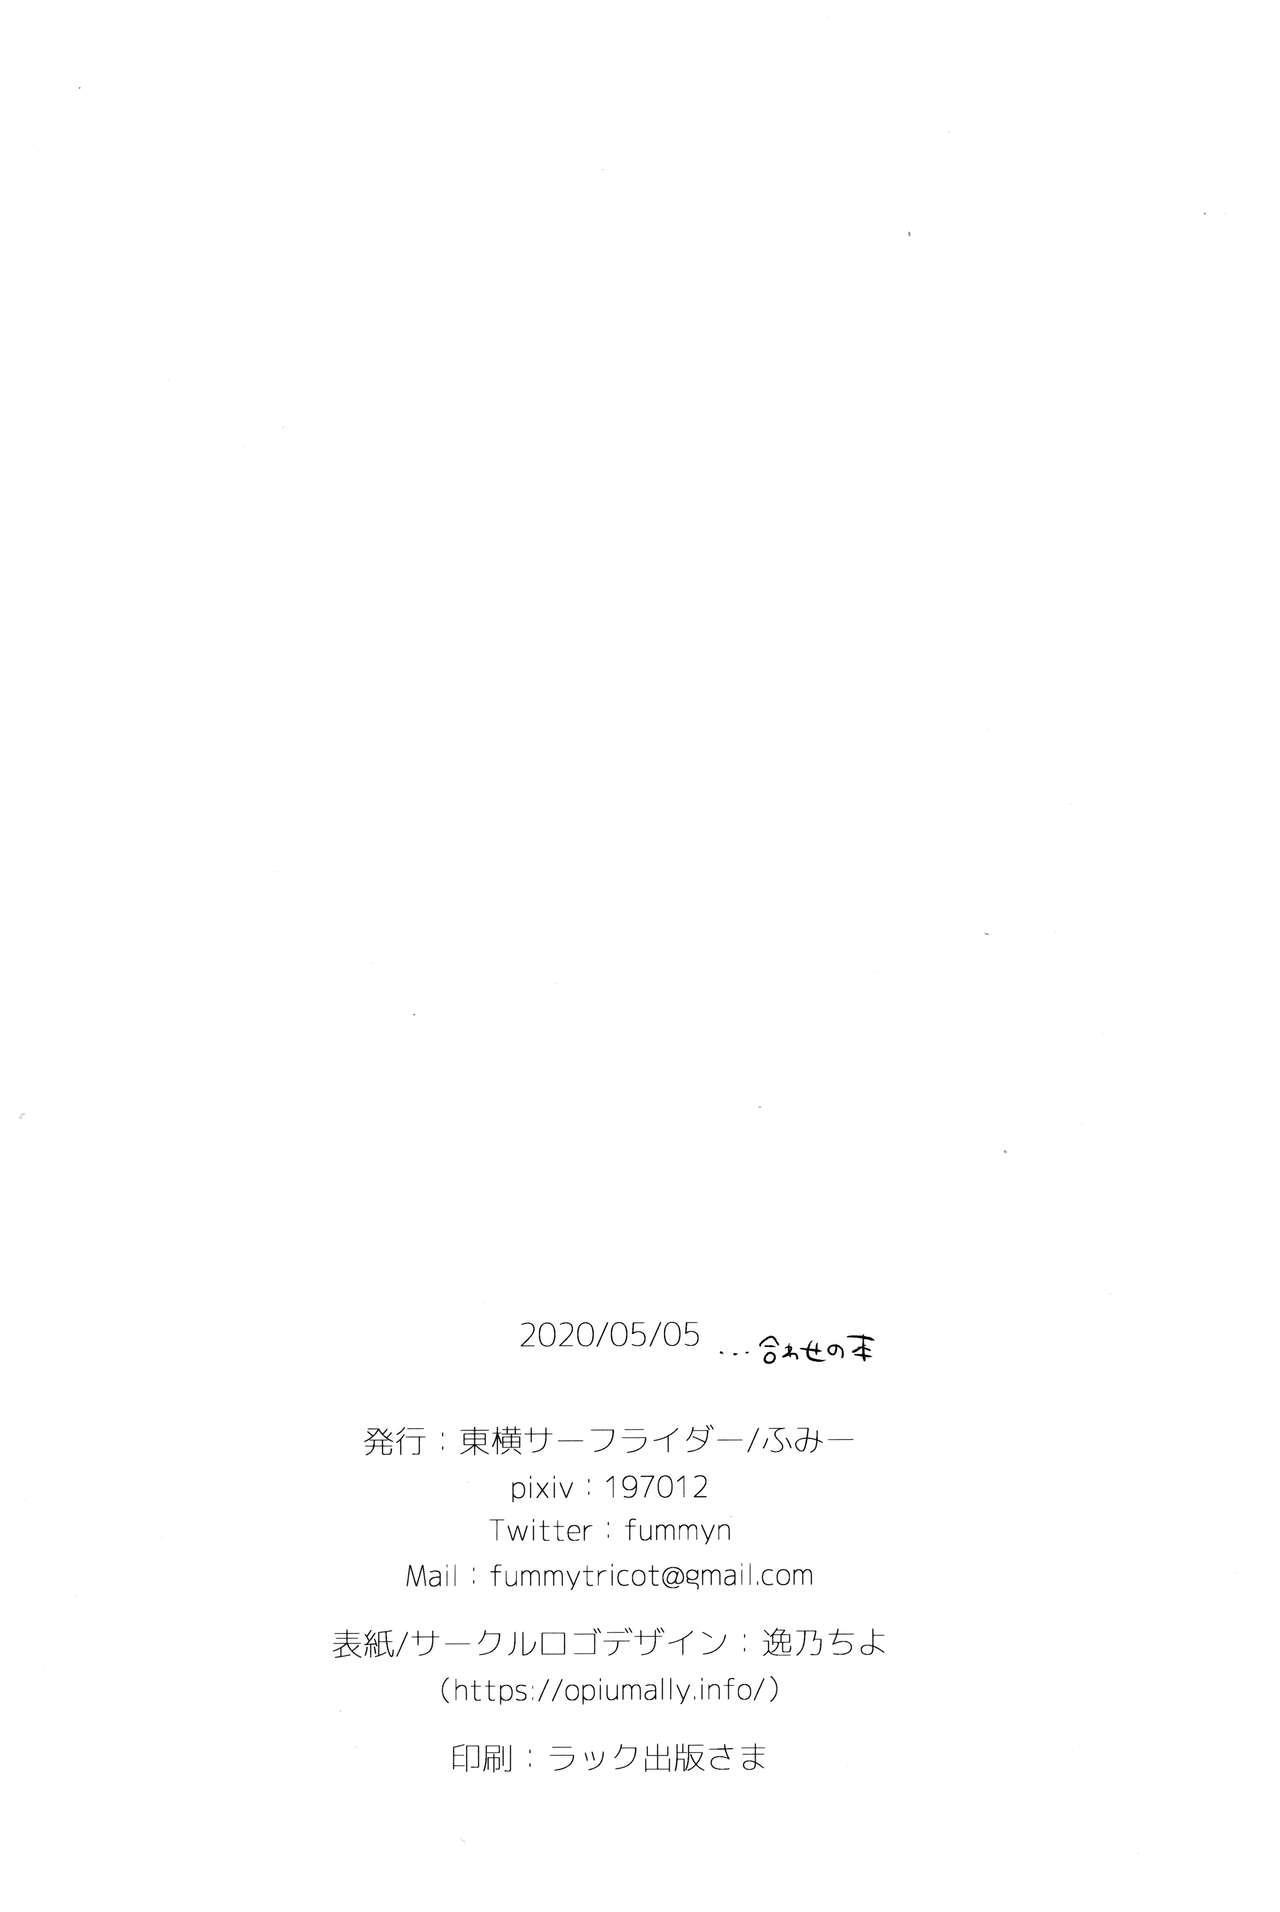 Boku-tachi wa, Koi o Shitenai Hazu datta. | We Are Not in Love, That's What I Thought 24